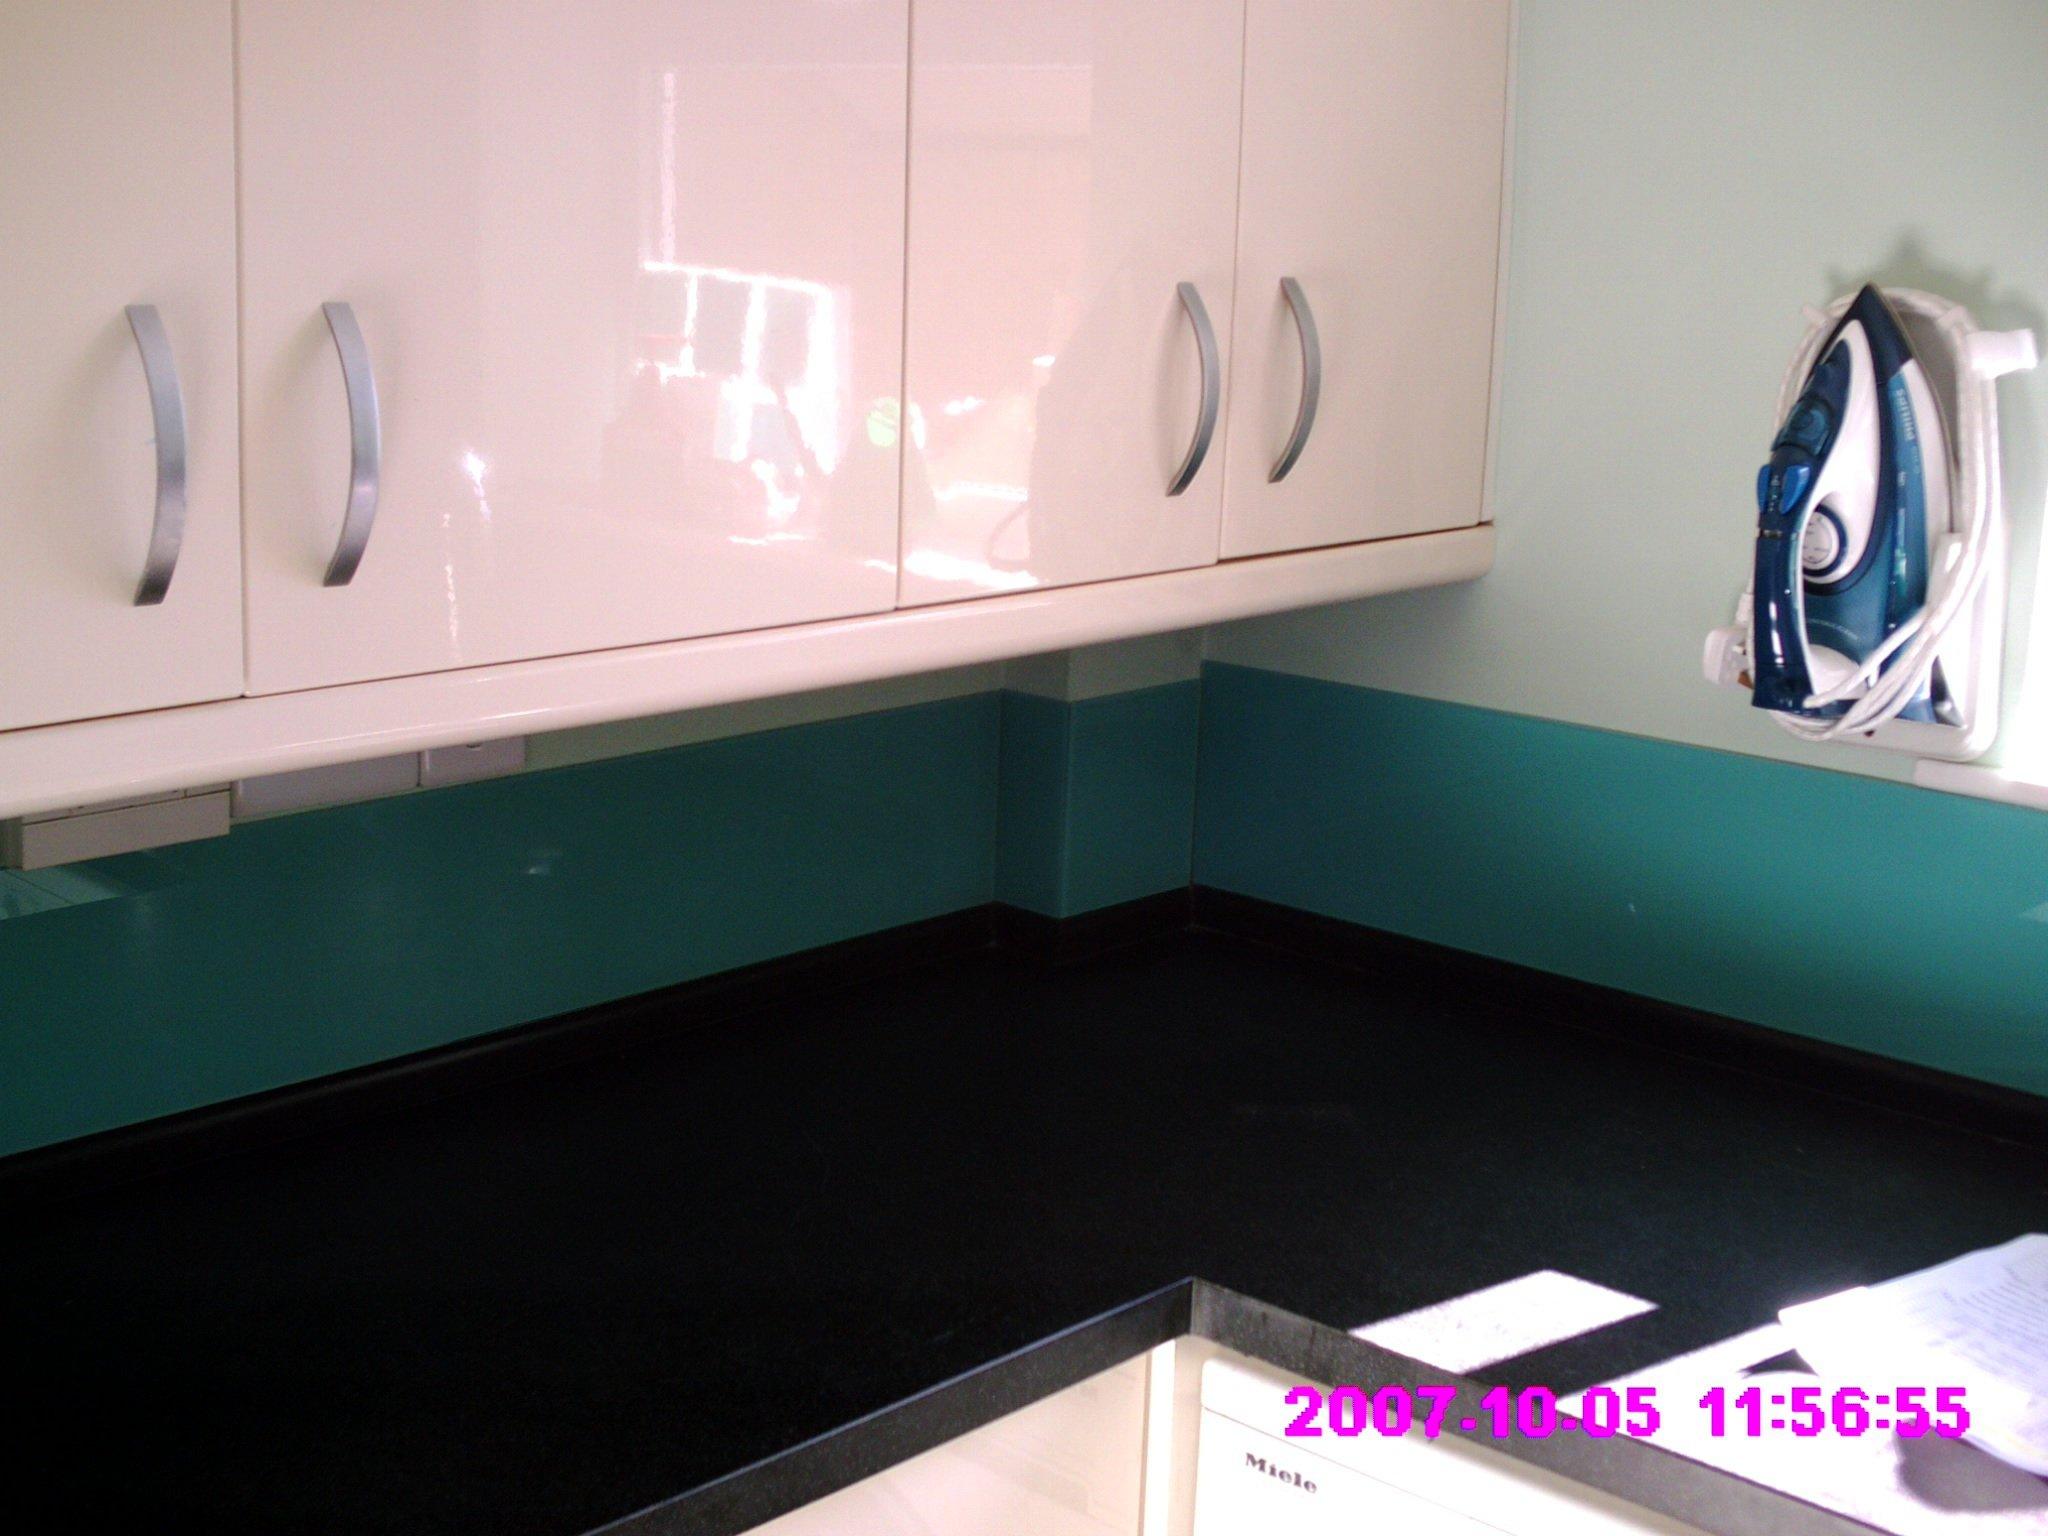 Glass for kitchen worktops